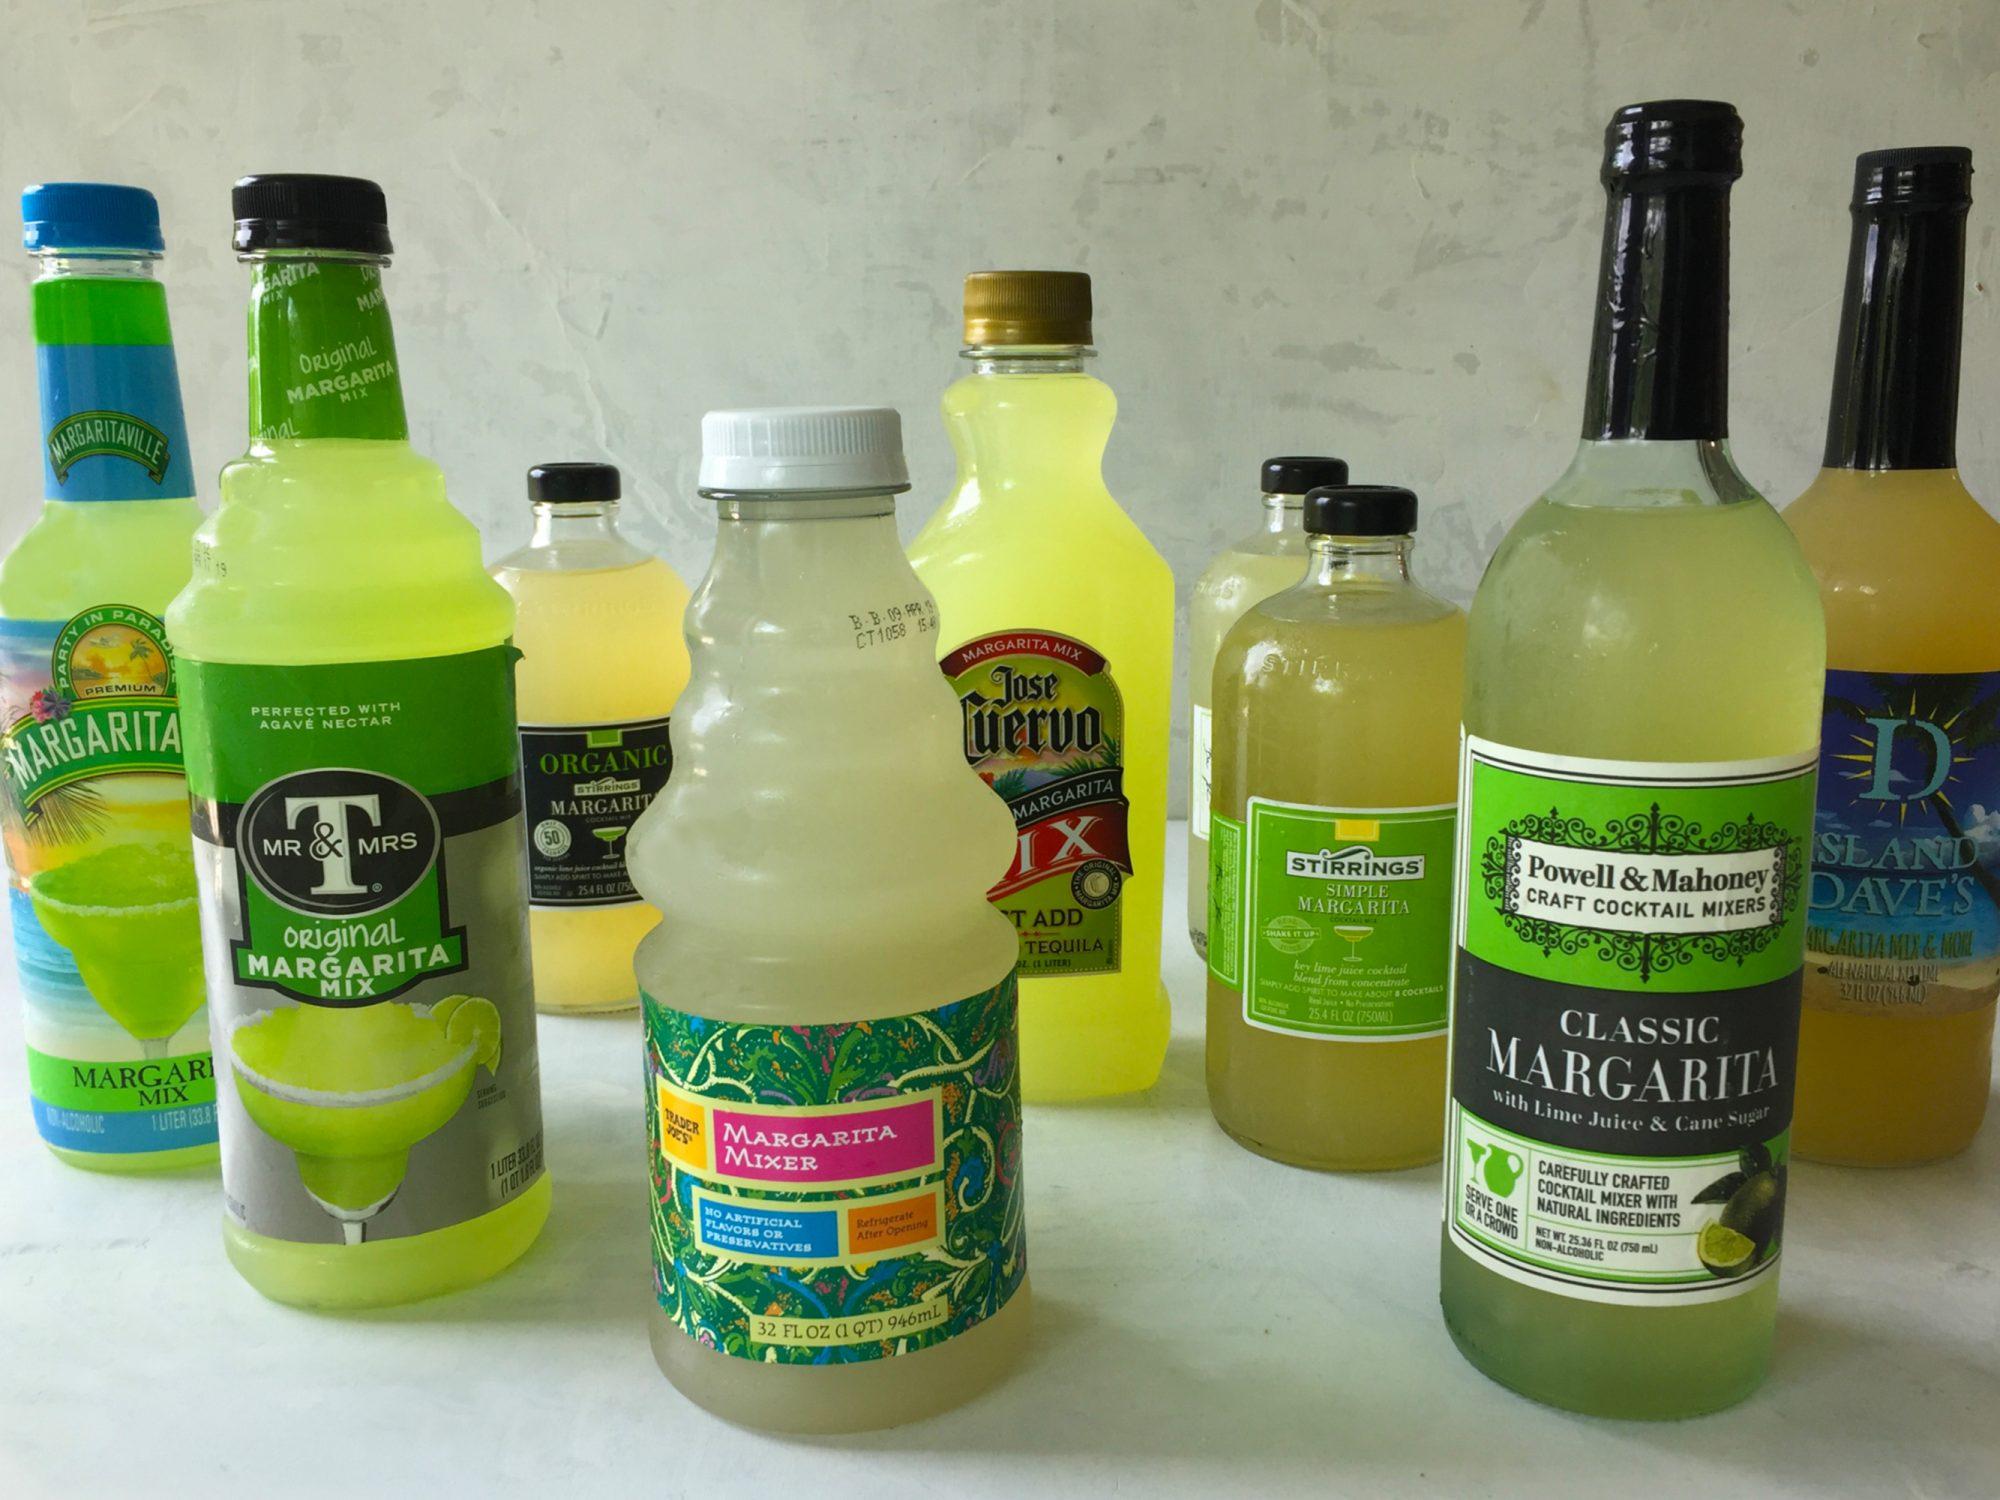 Best Margarita Mix to Buy - MyRecipes